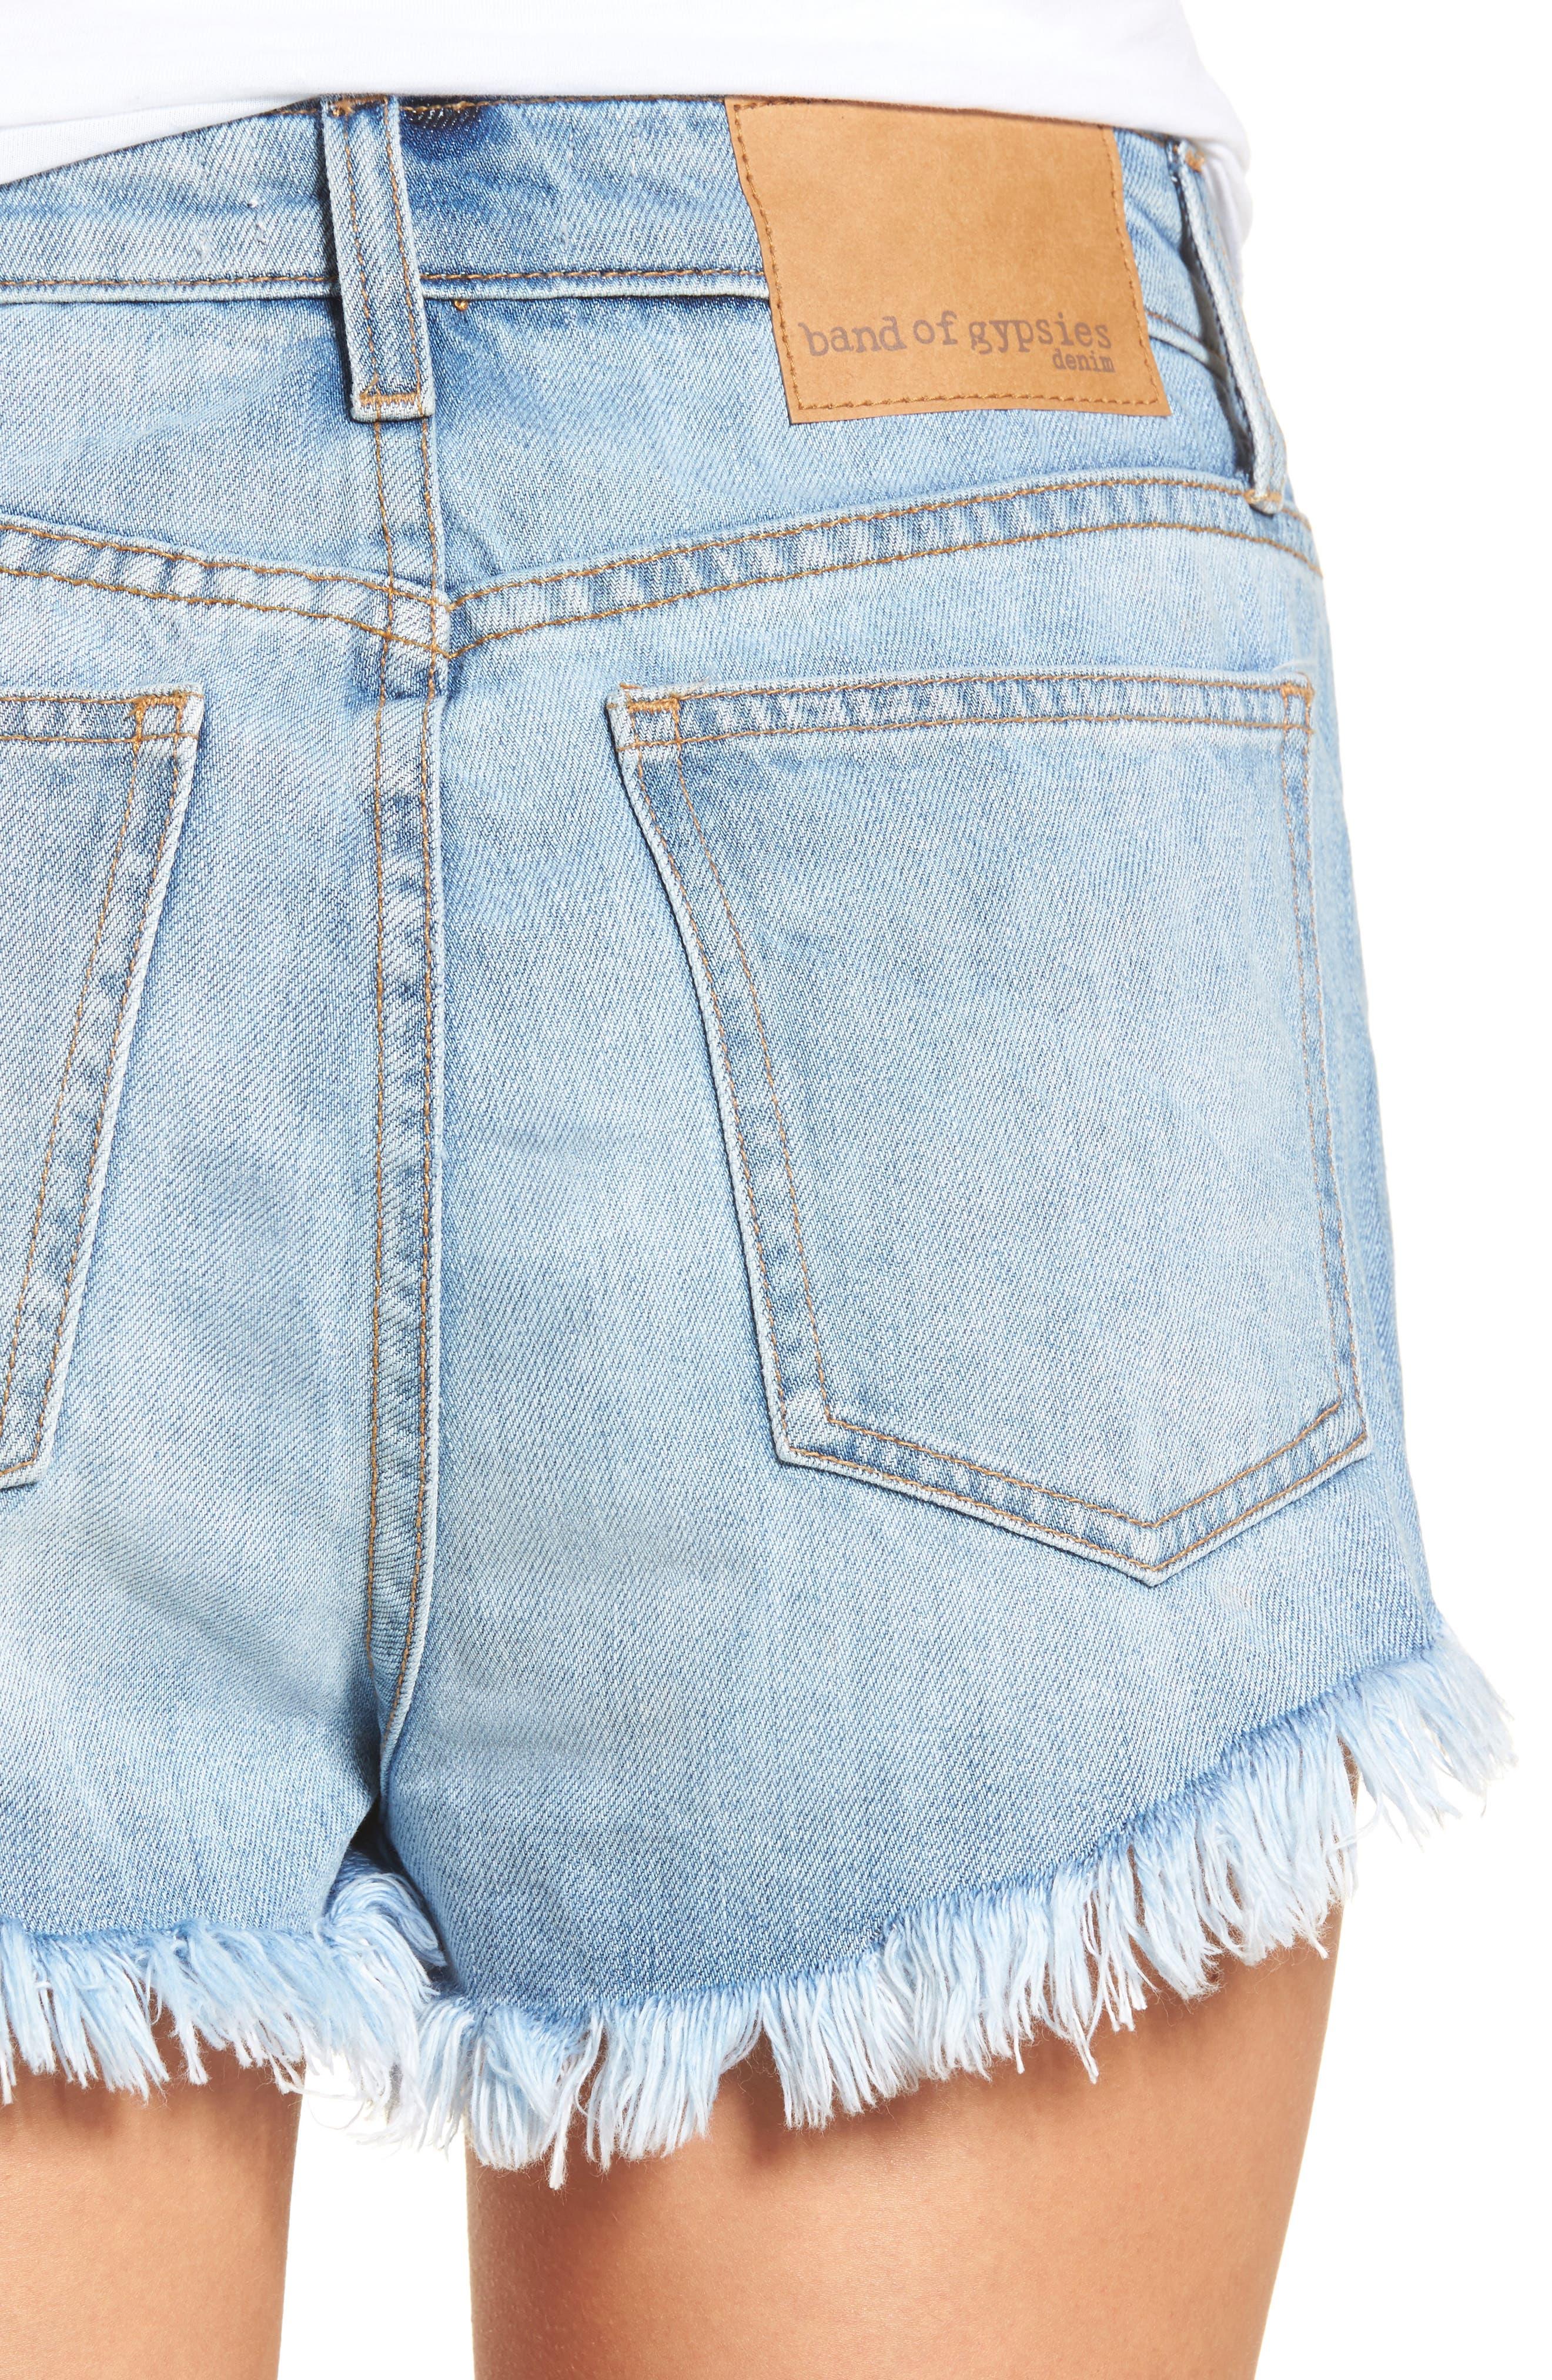 Riley Cheeky Denim Shorts,                             Alternate thumbnail 4, color,                             400